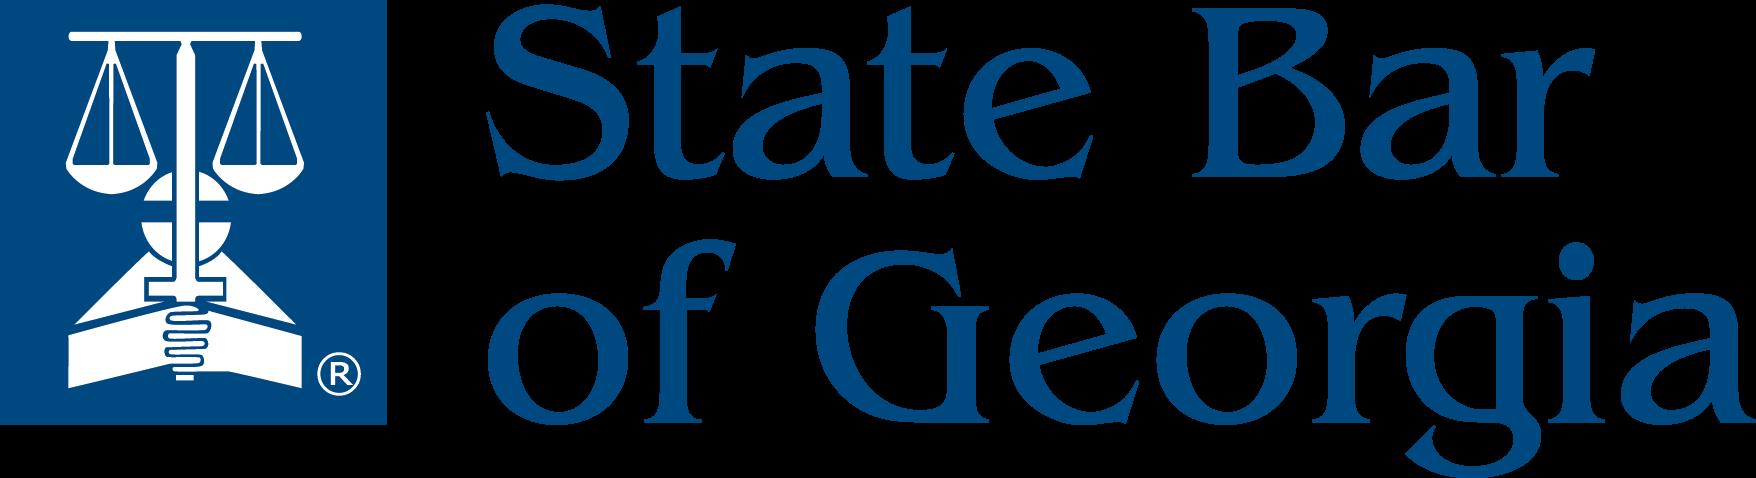 State-Bar-of-Georgia.png